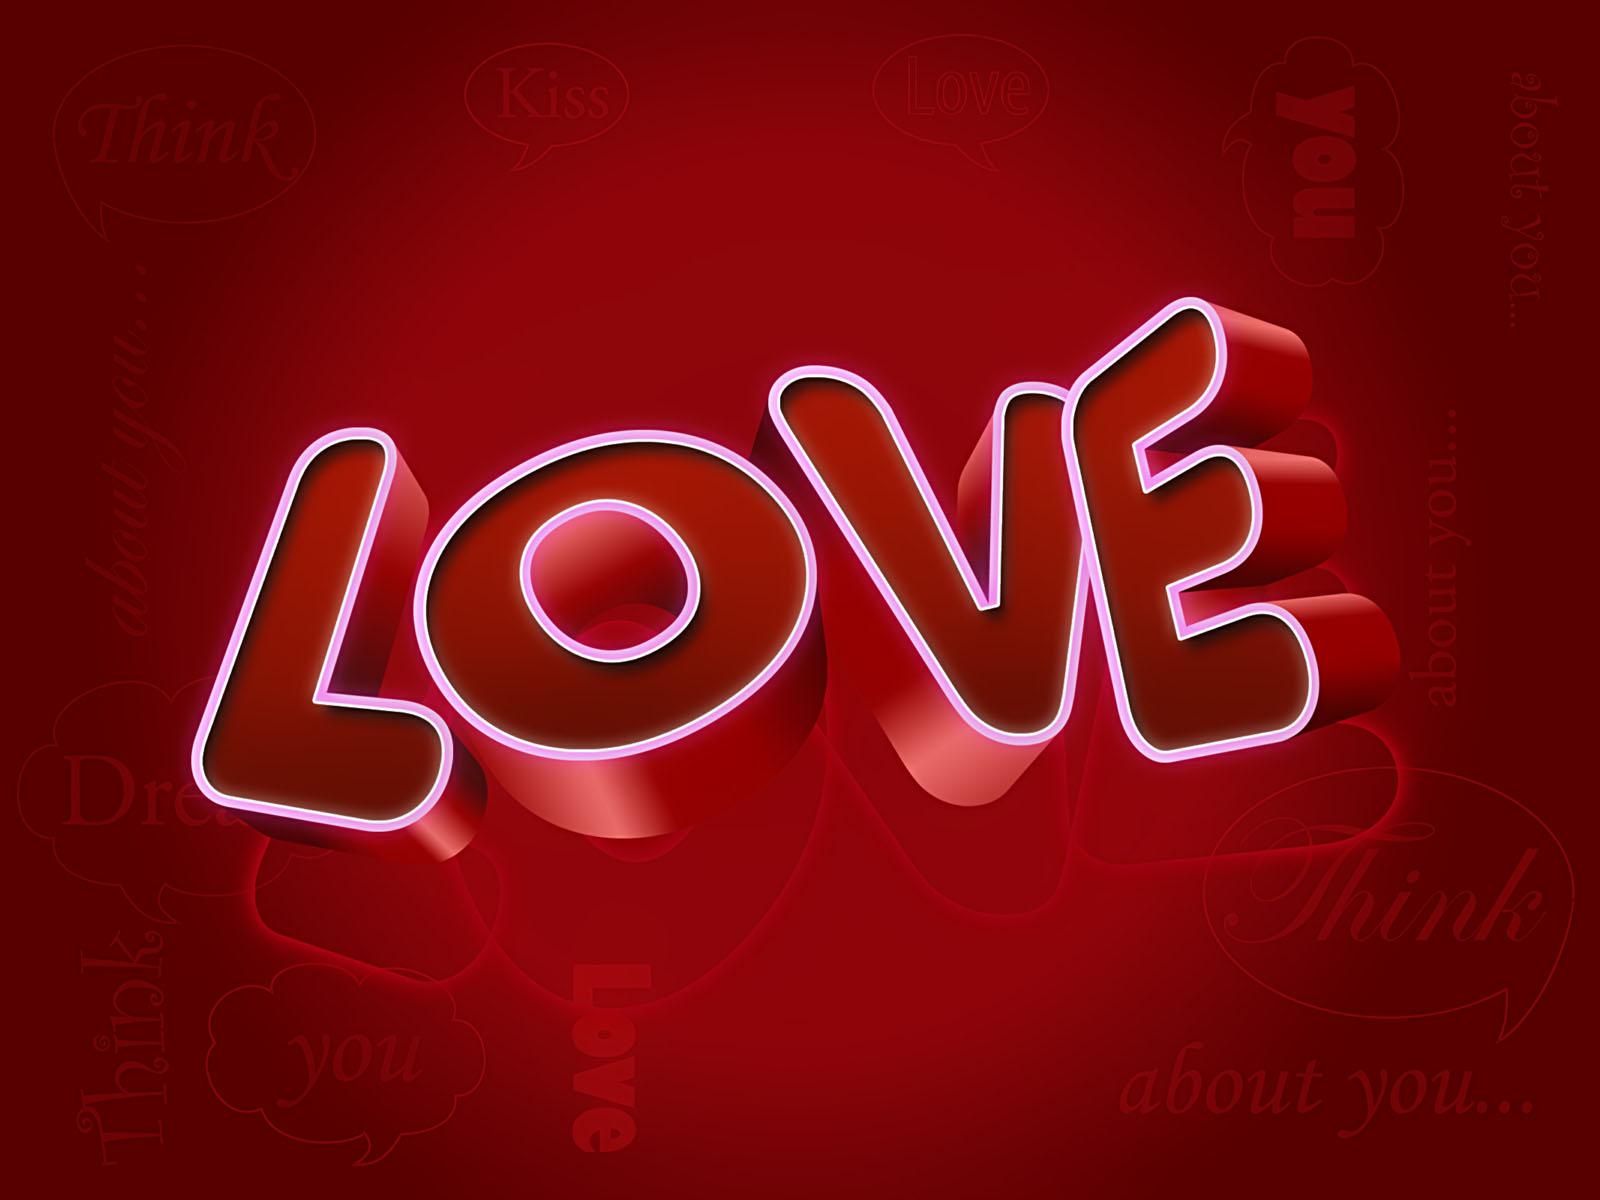 Love Words Wallpapers